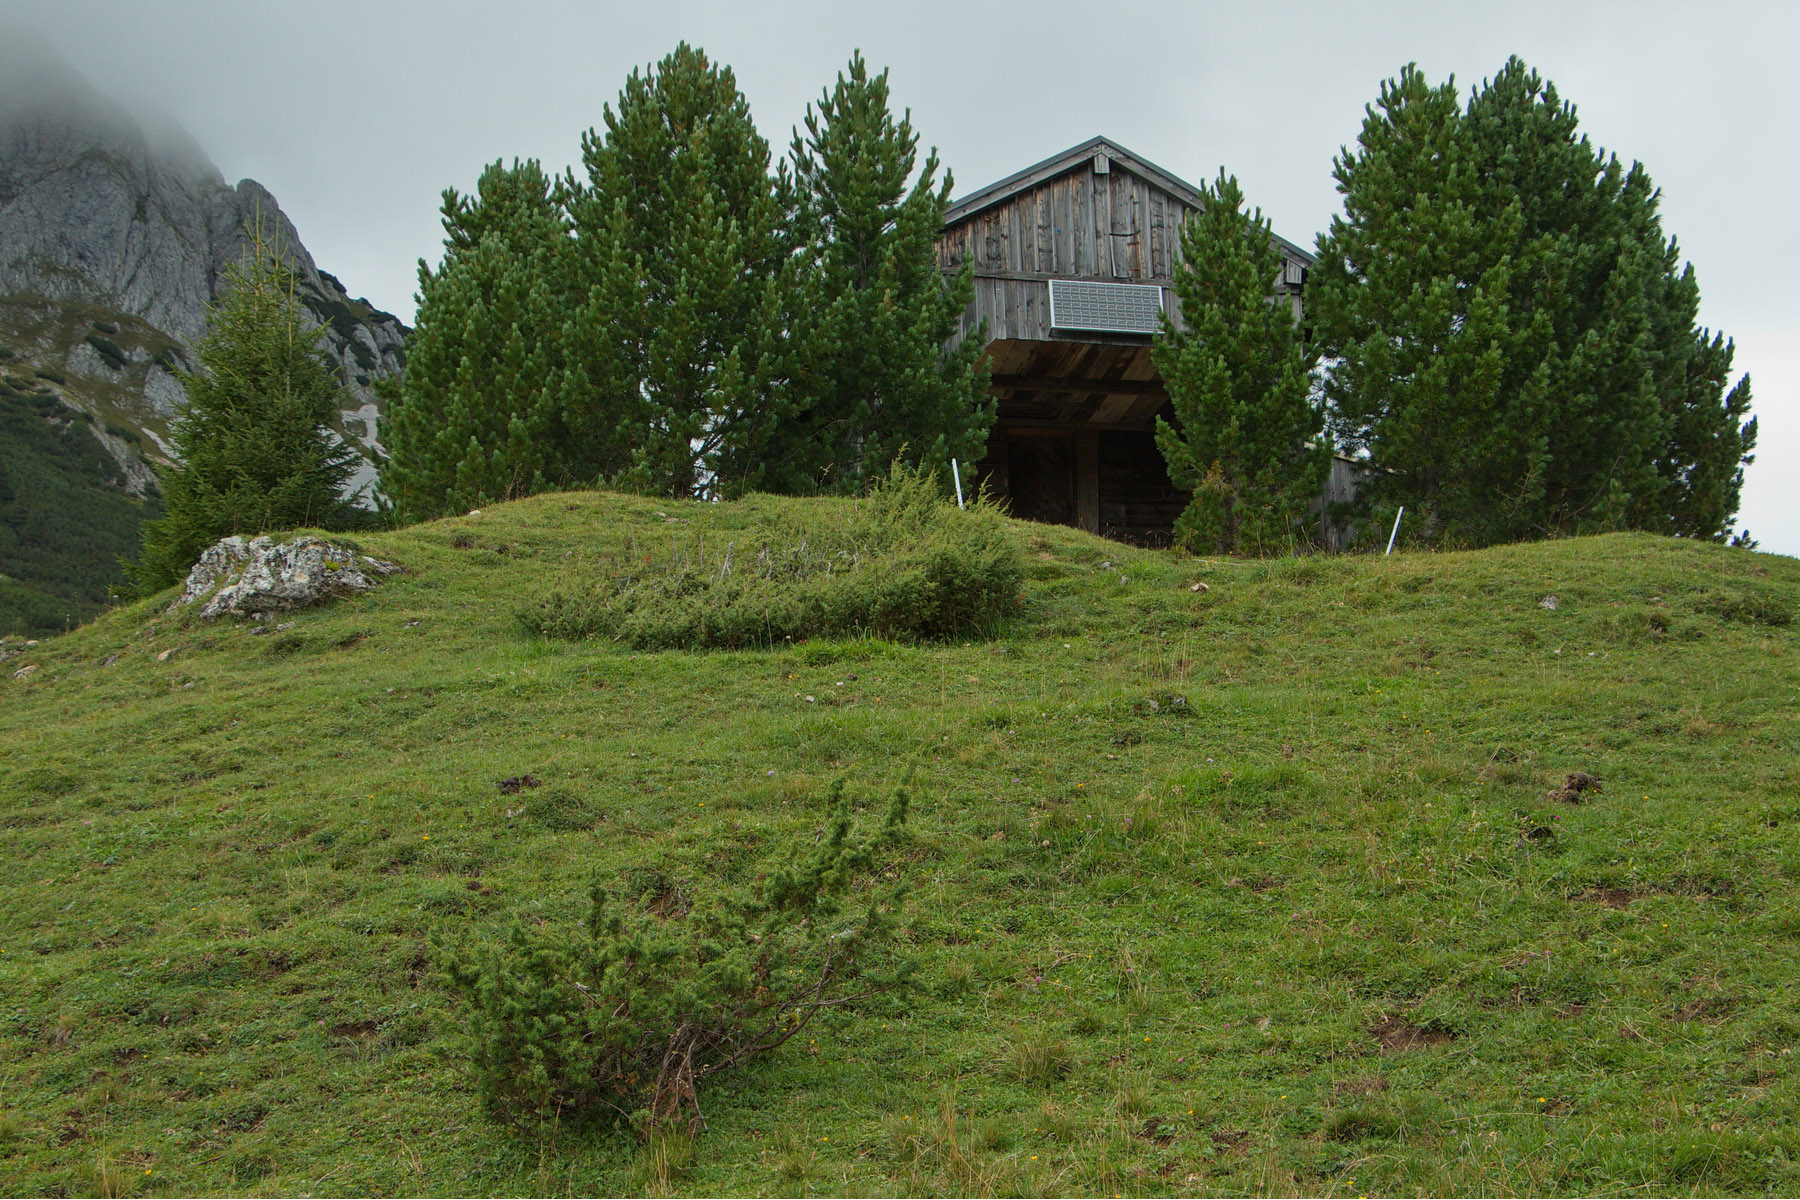 Wooden house in Austria